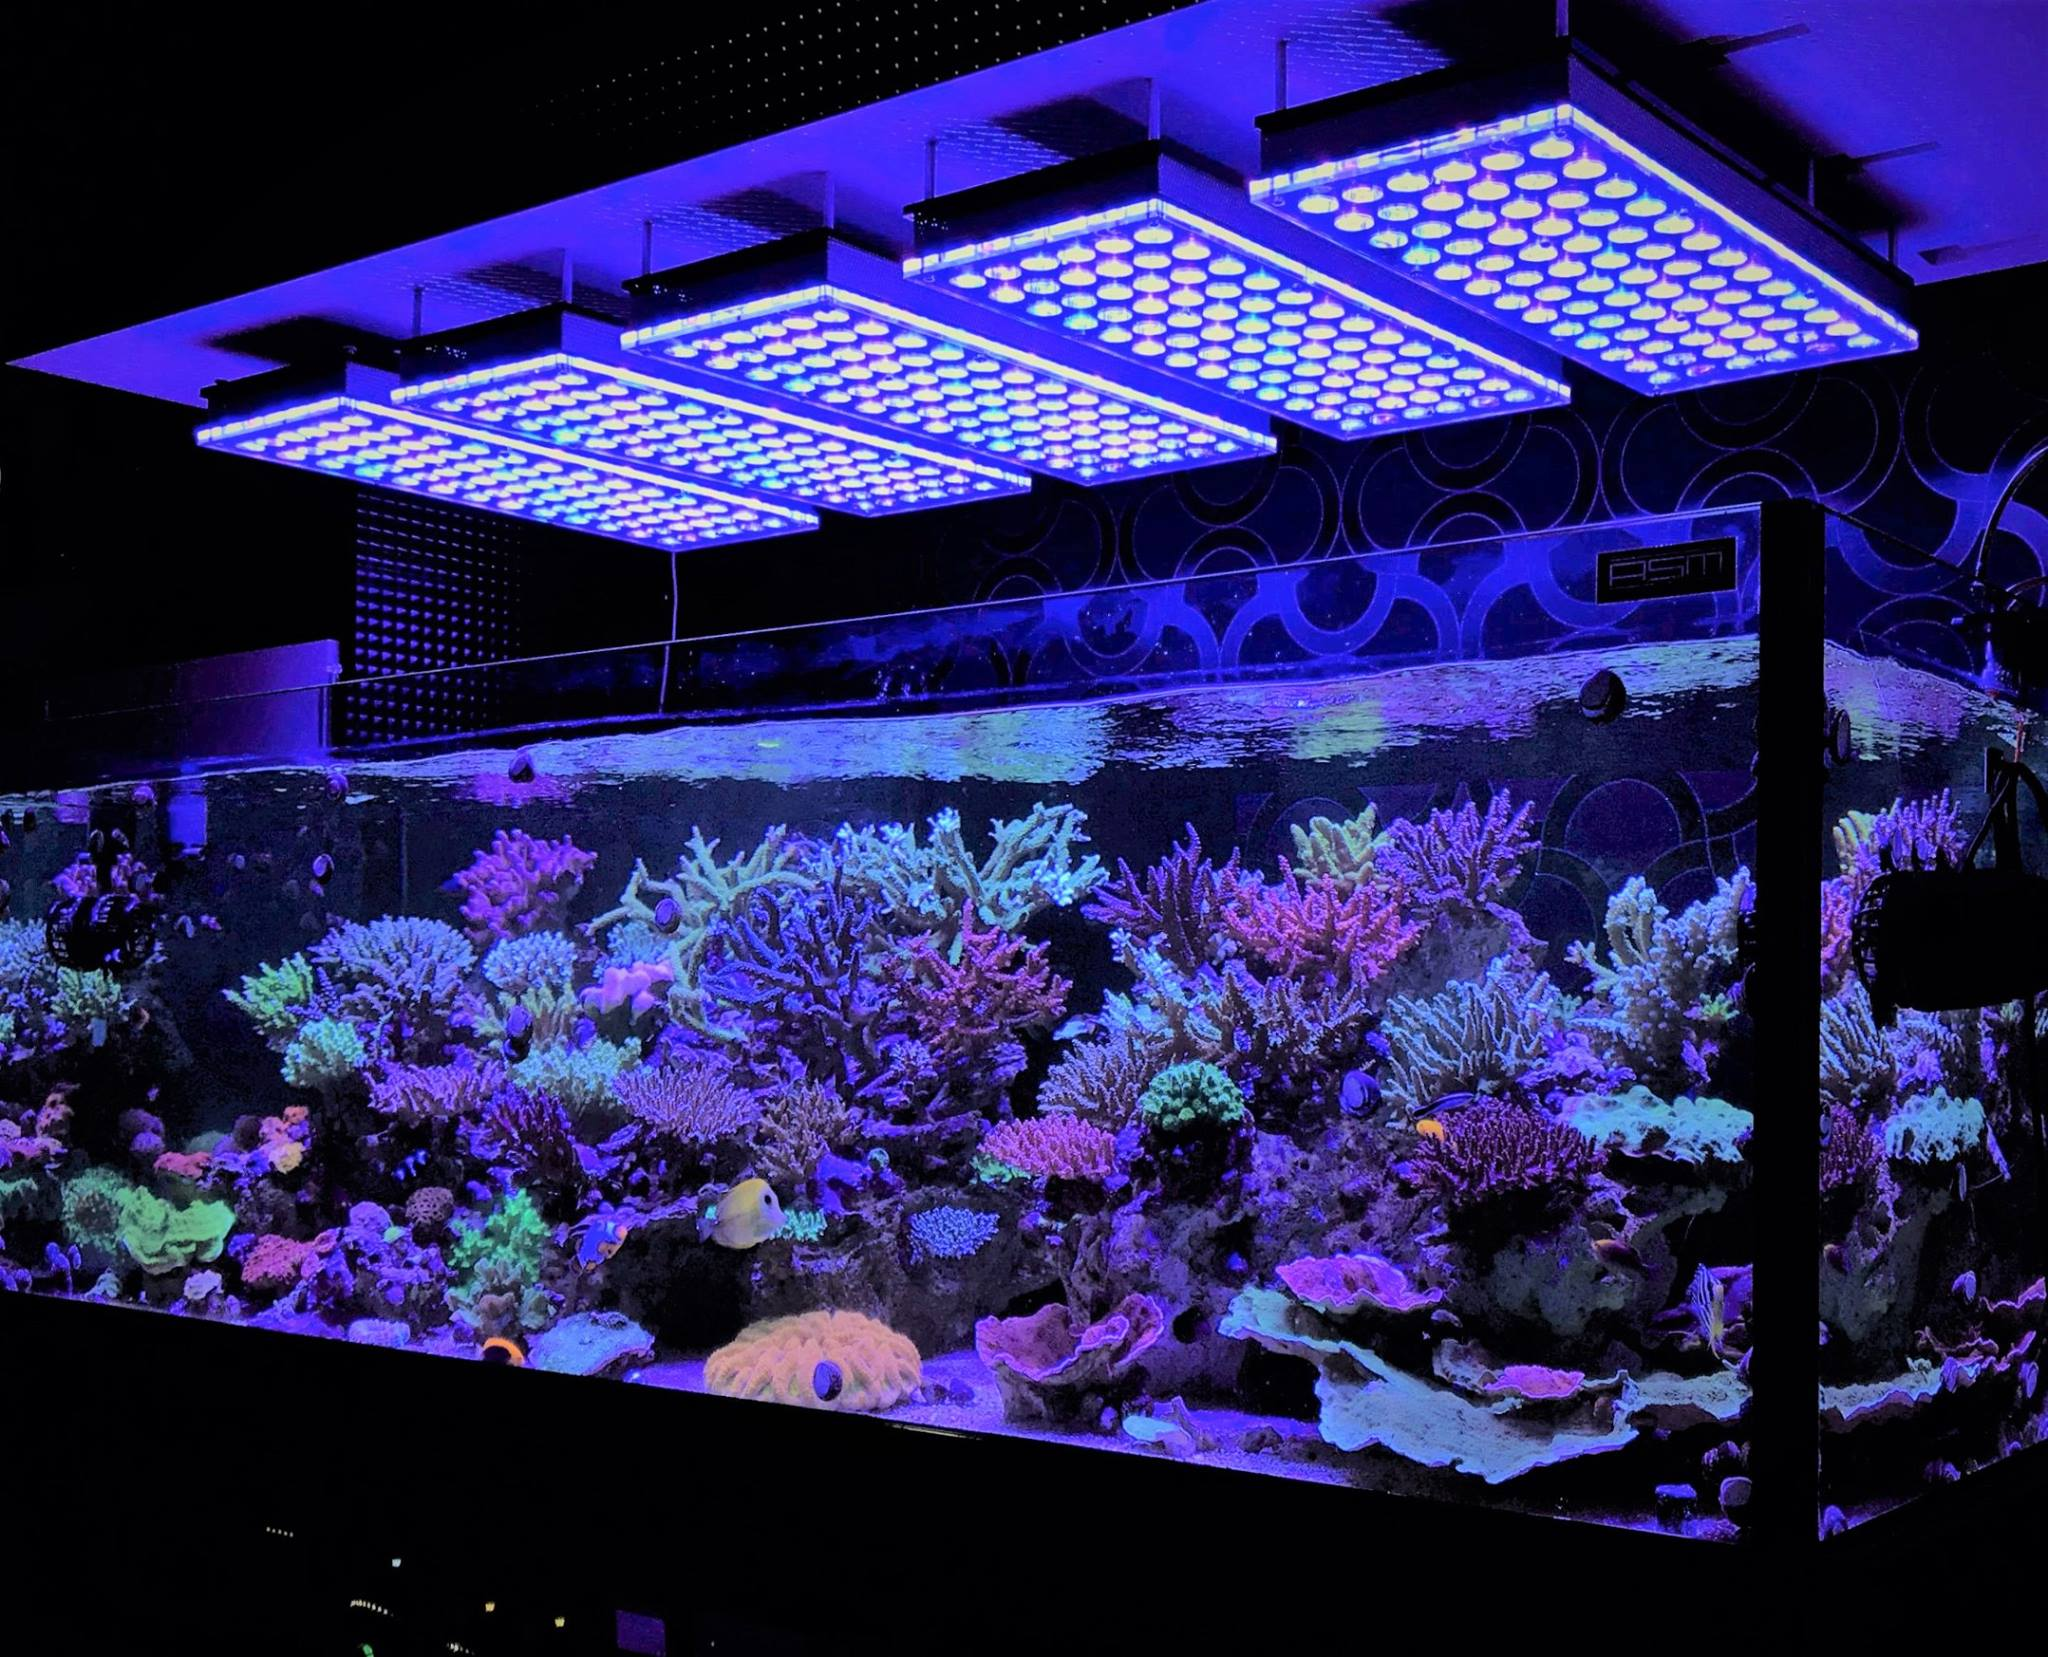 aquarium led lighting photos meilleurs galerie d 39 clairage led aquarium reef orphek. Black Bedroom Furniture Sets. Home Design Ideas